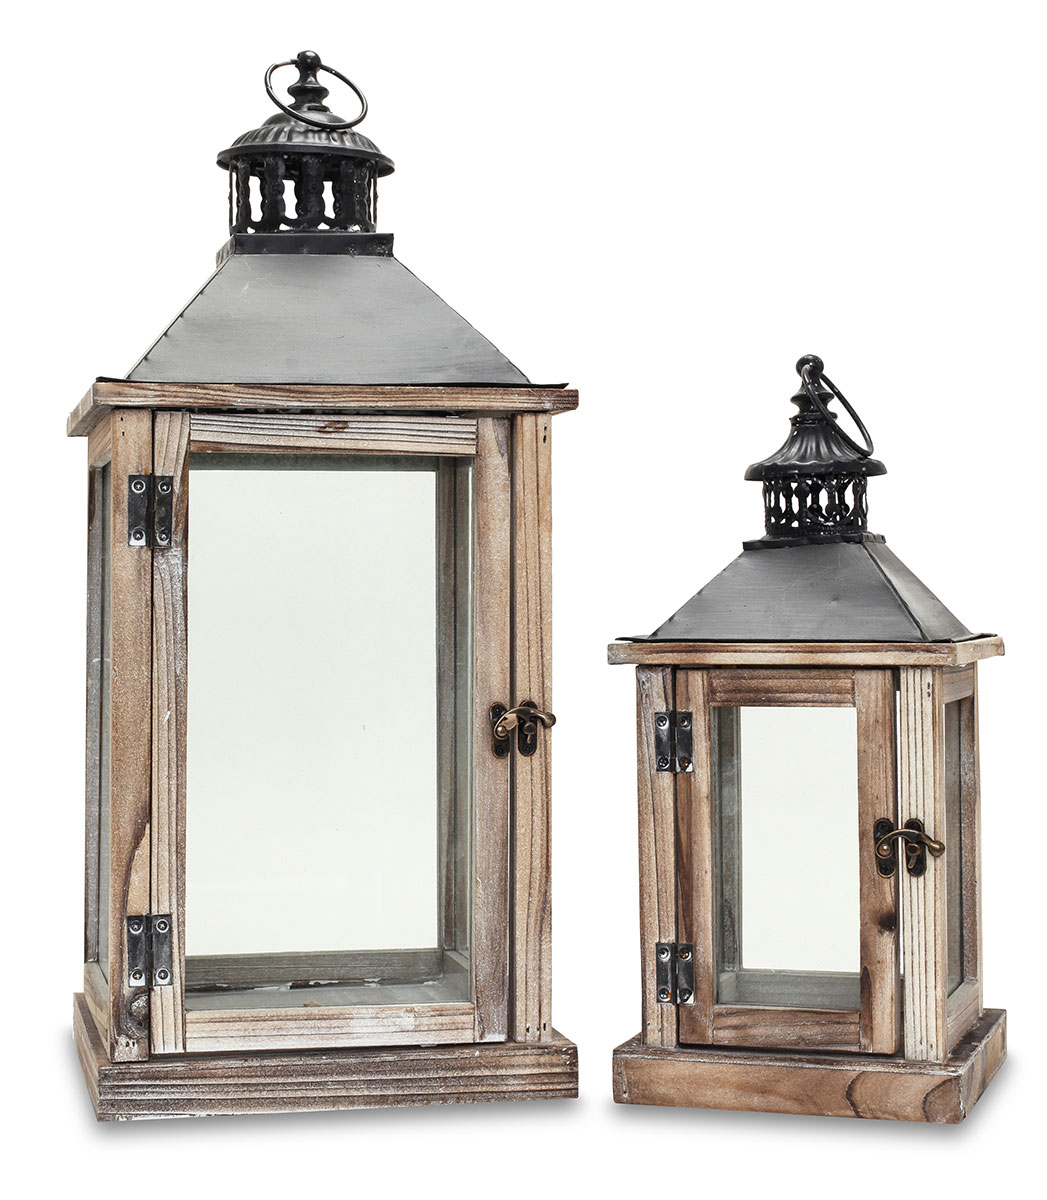 2tlg. Laternen Set Holz natur braun Metall Glas Shabby Chic Garten ...